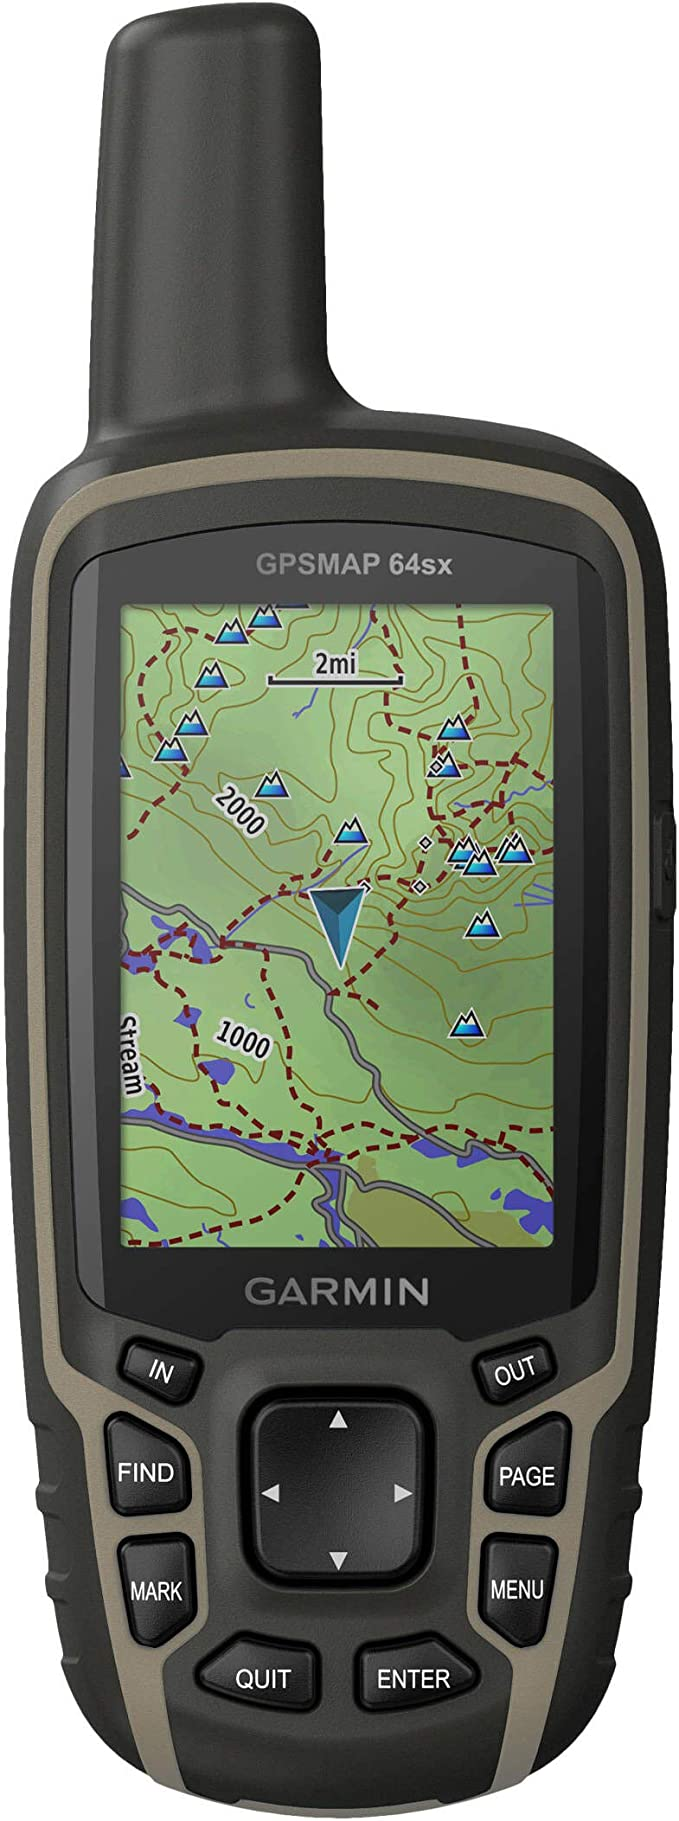 Garmin Gpsmap 64sx Outdoor Navi Gps Glonass Bluetooth Ant Topo Dtl V9 Pro Sport Freizeit